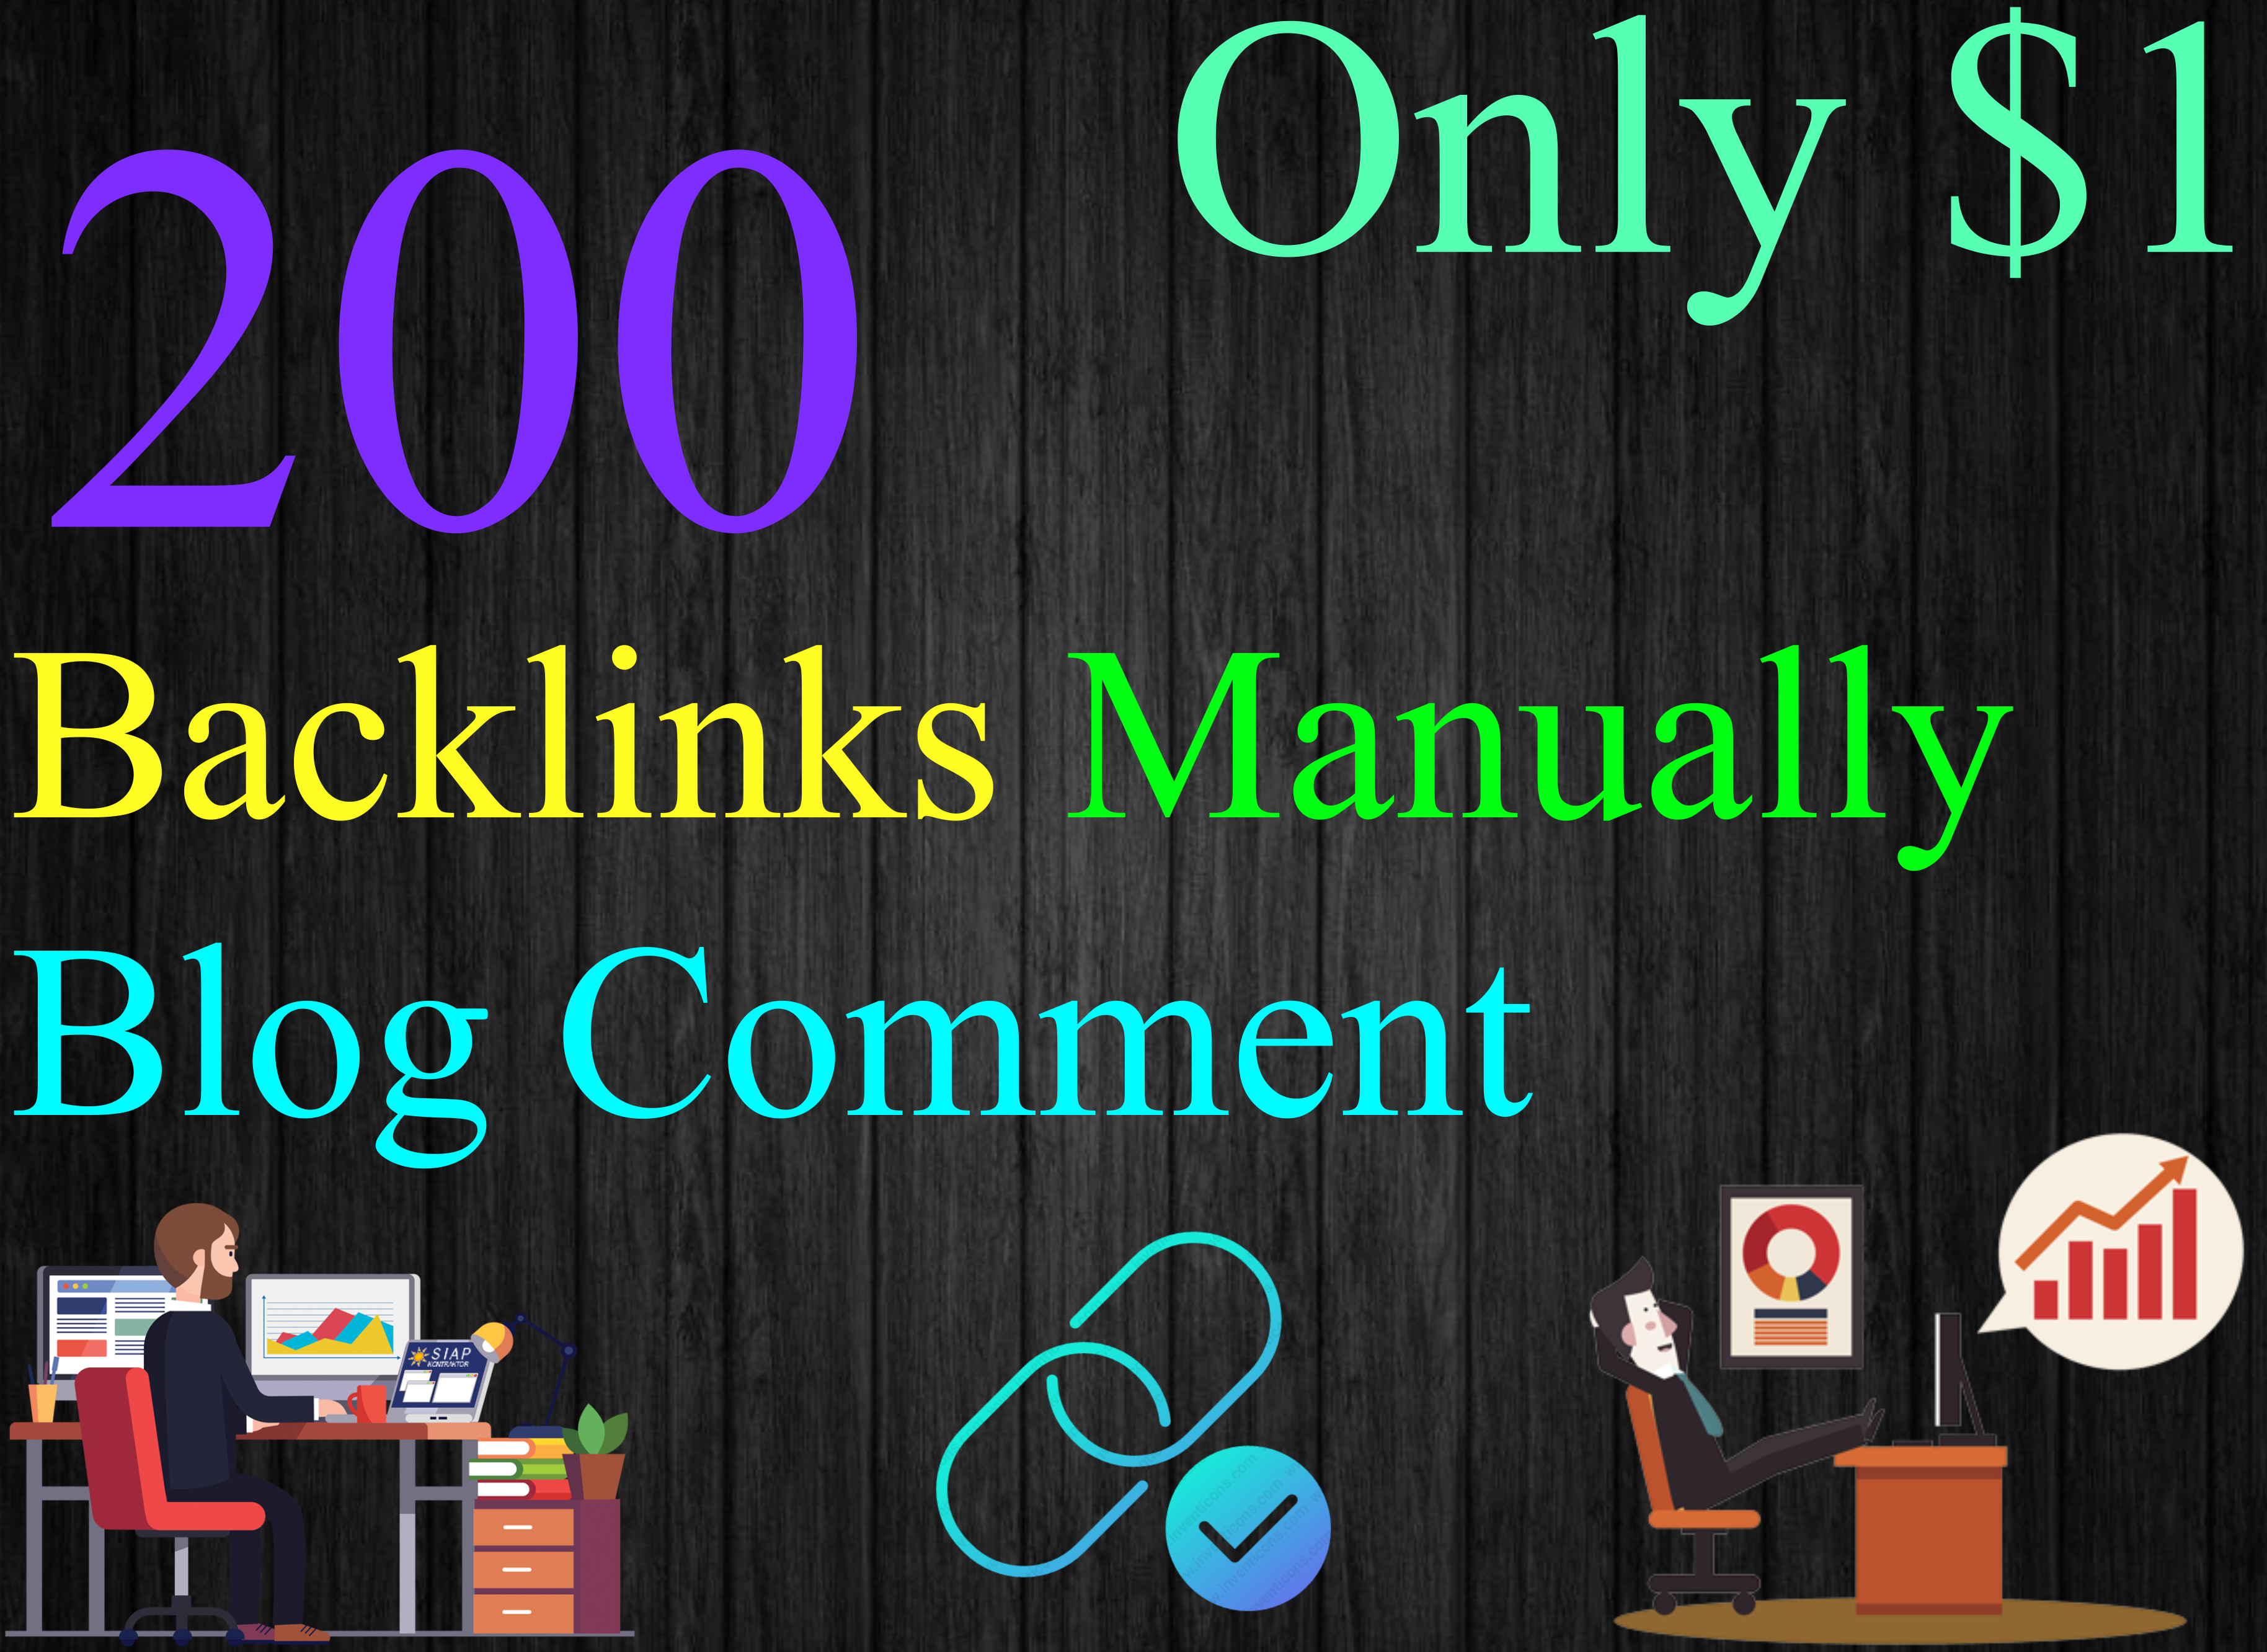 i Will Manually High DA PA 200 Dofollow Backlinks for $1 | Blog, Can